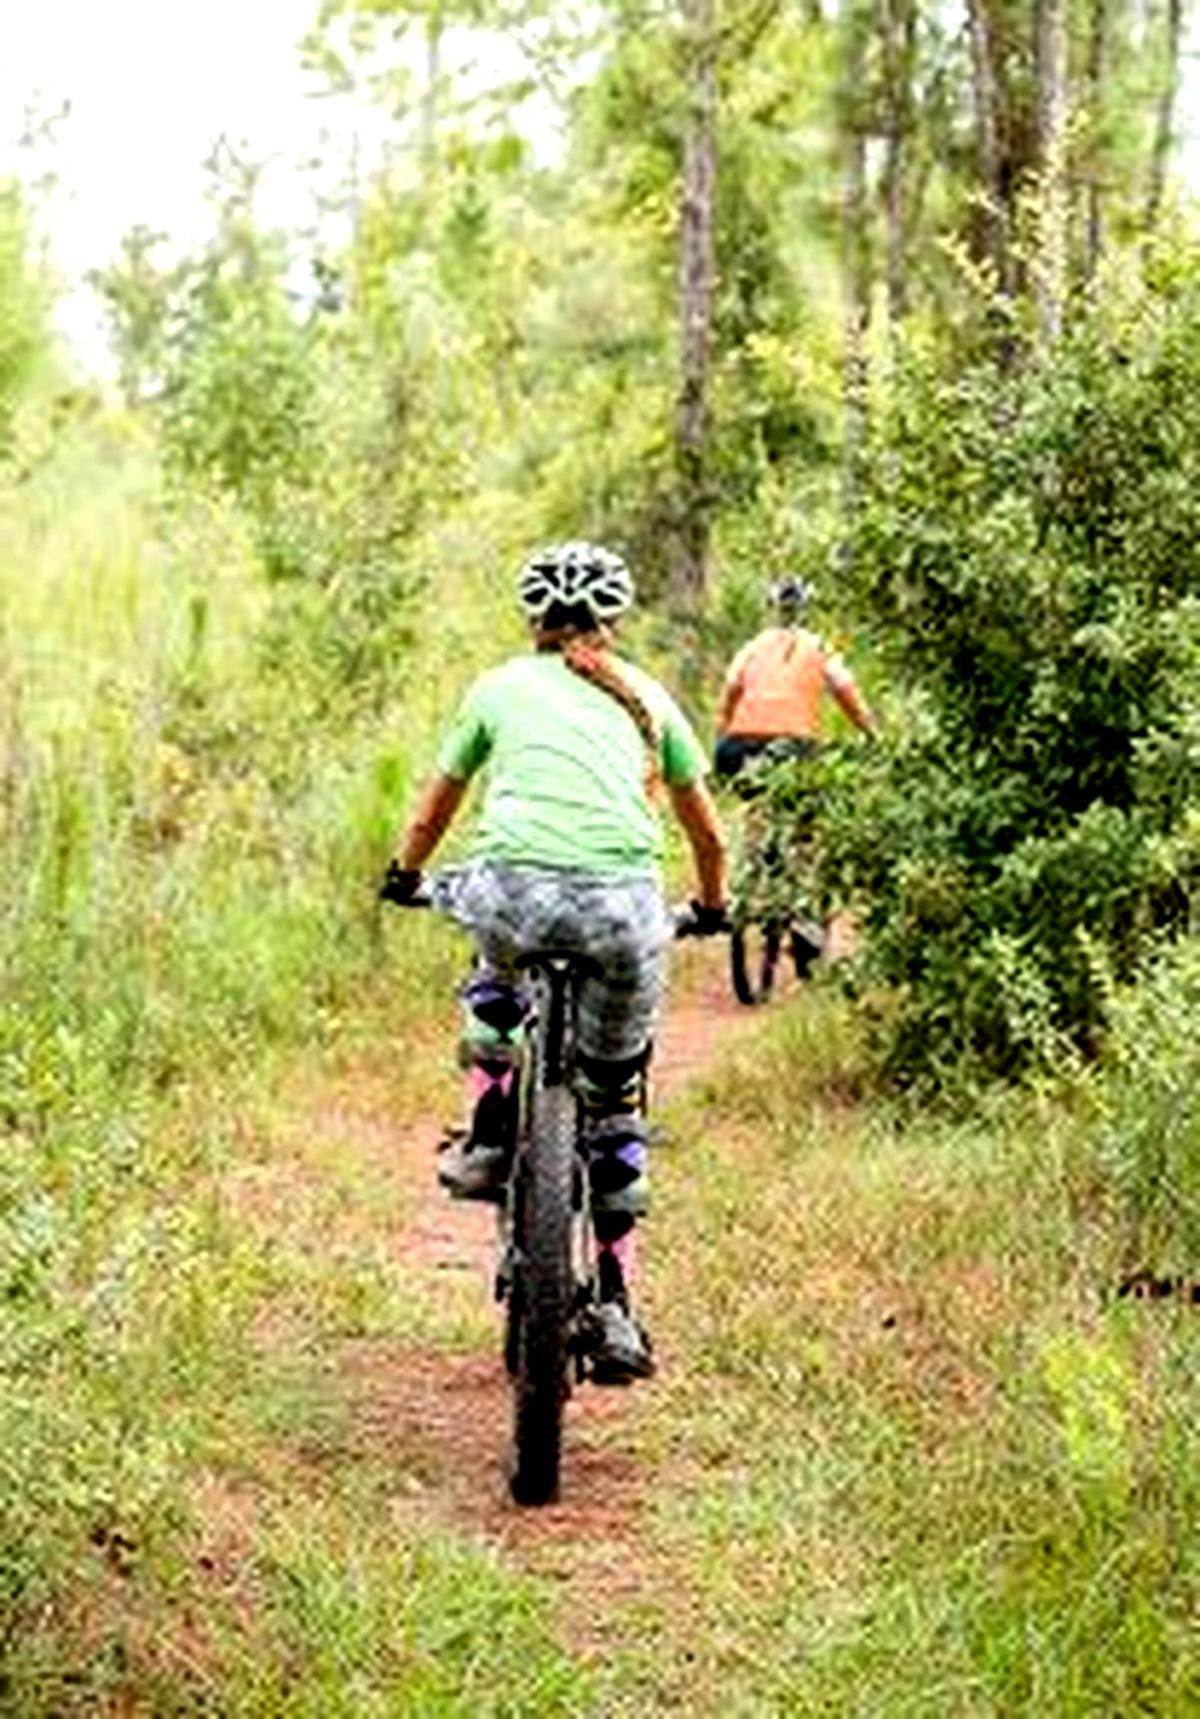 The Preserve bike trails